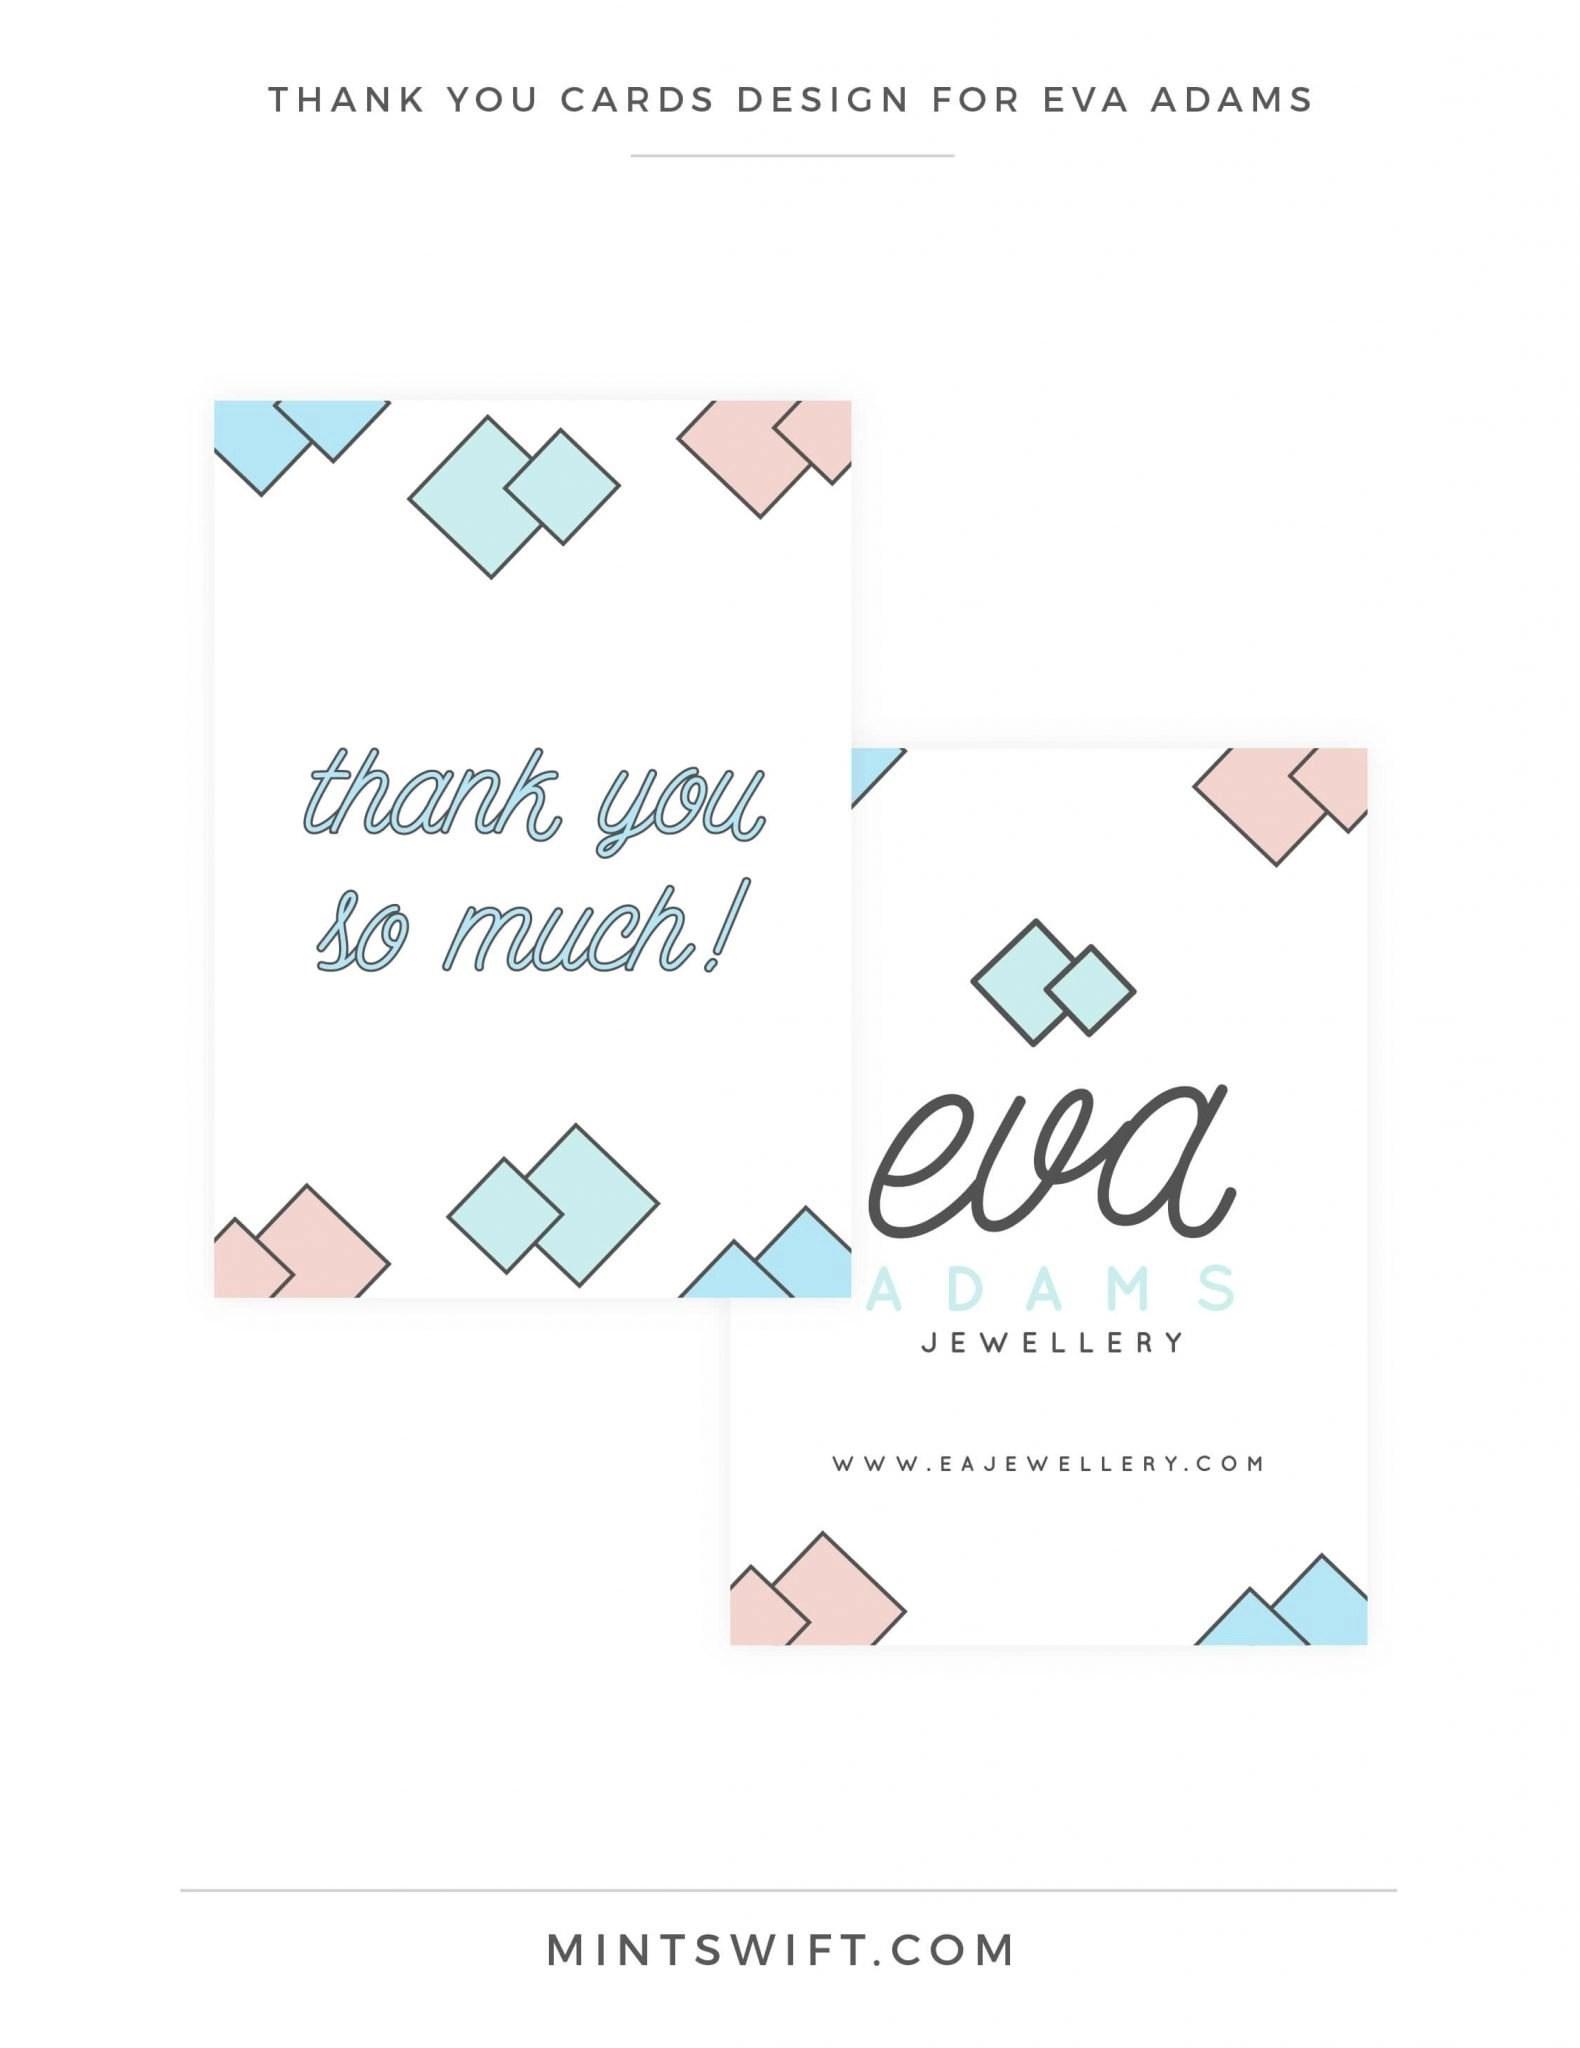 Eva Adams - Thank you cards design - MintSwift